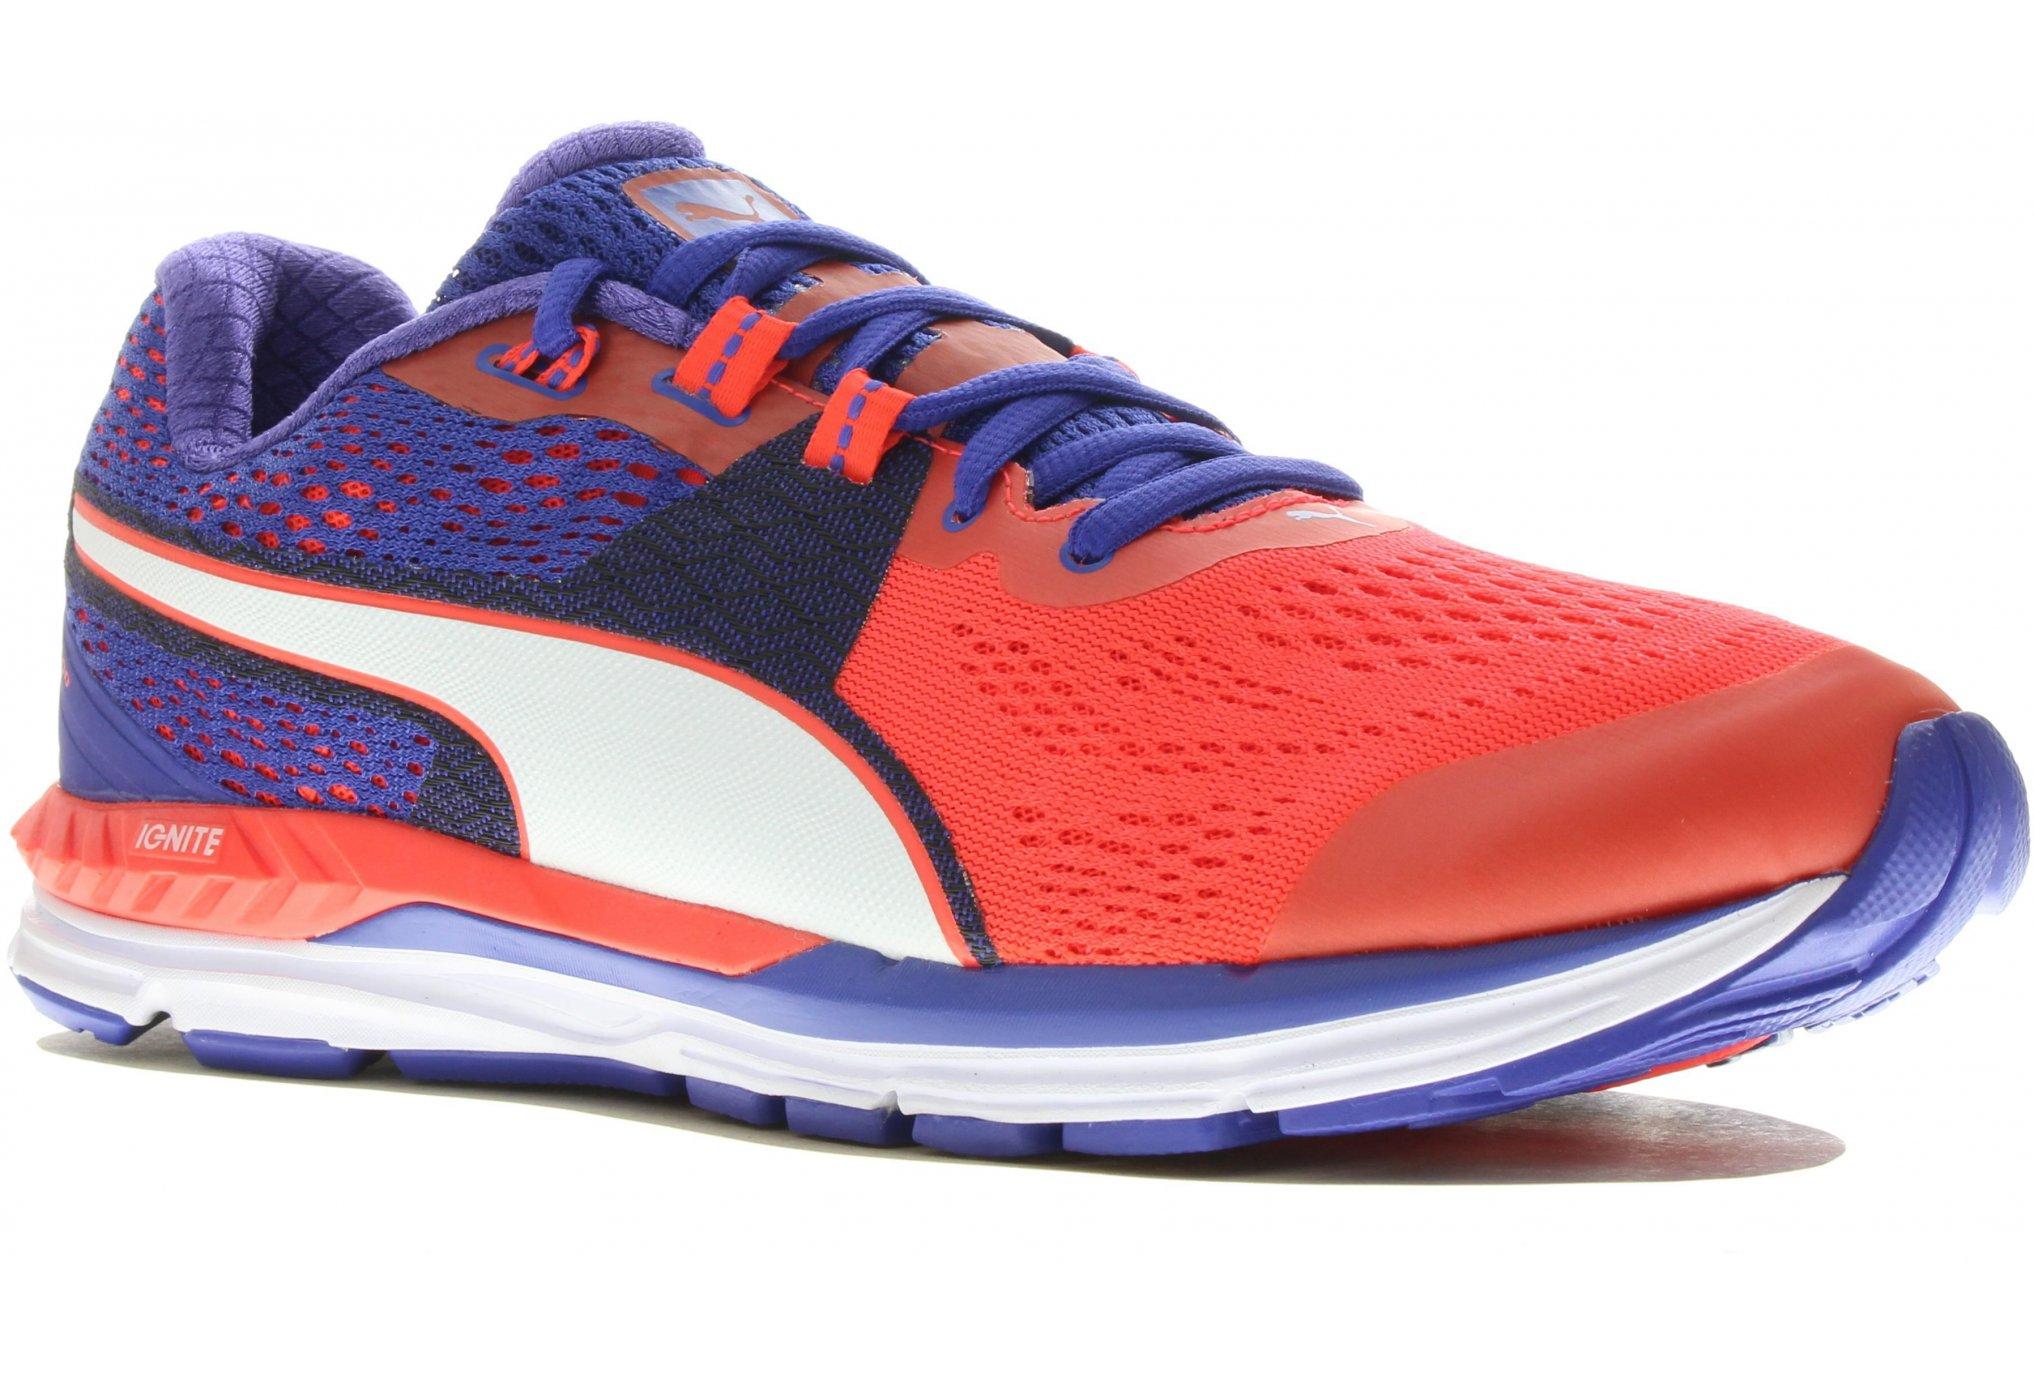 Puma Speed 600 Ignite W Diététique Chaussures femme